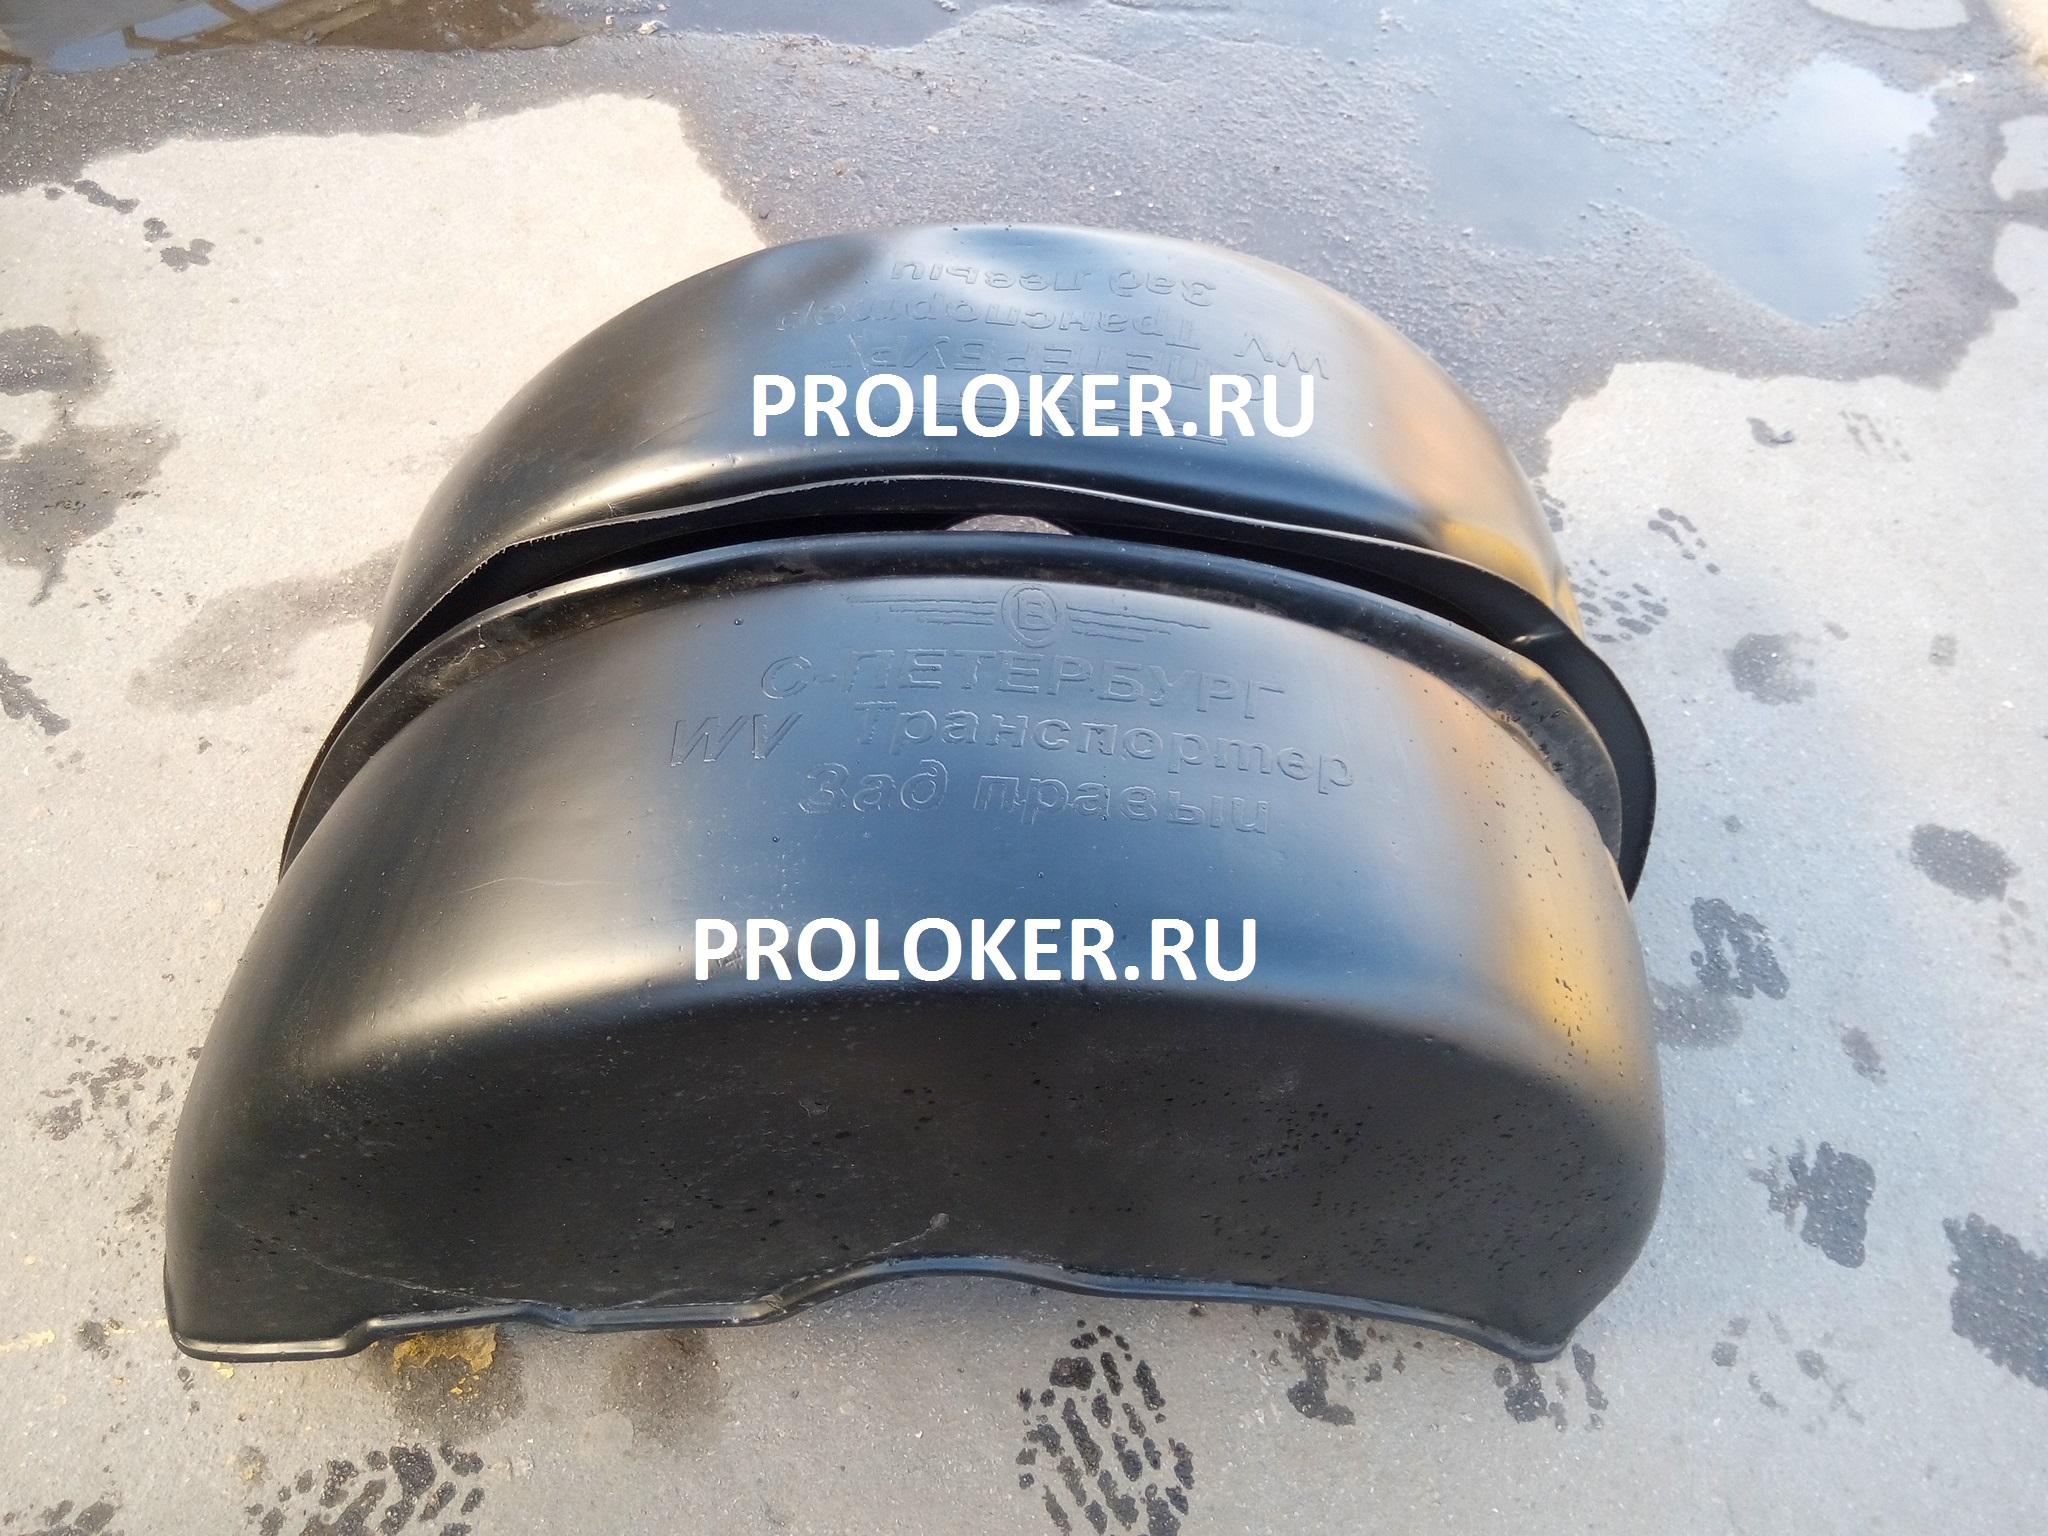 Локеры транспортер пластинчатый транспортер назначение